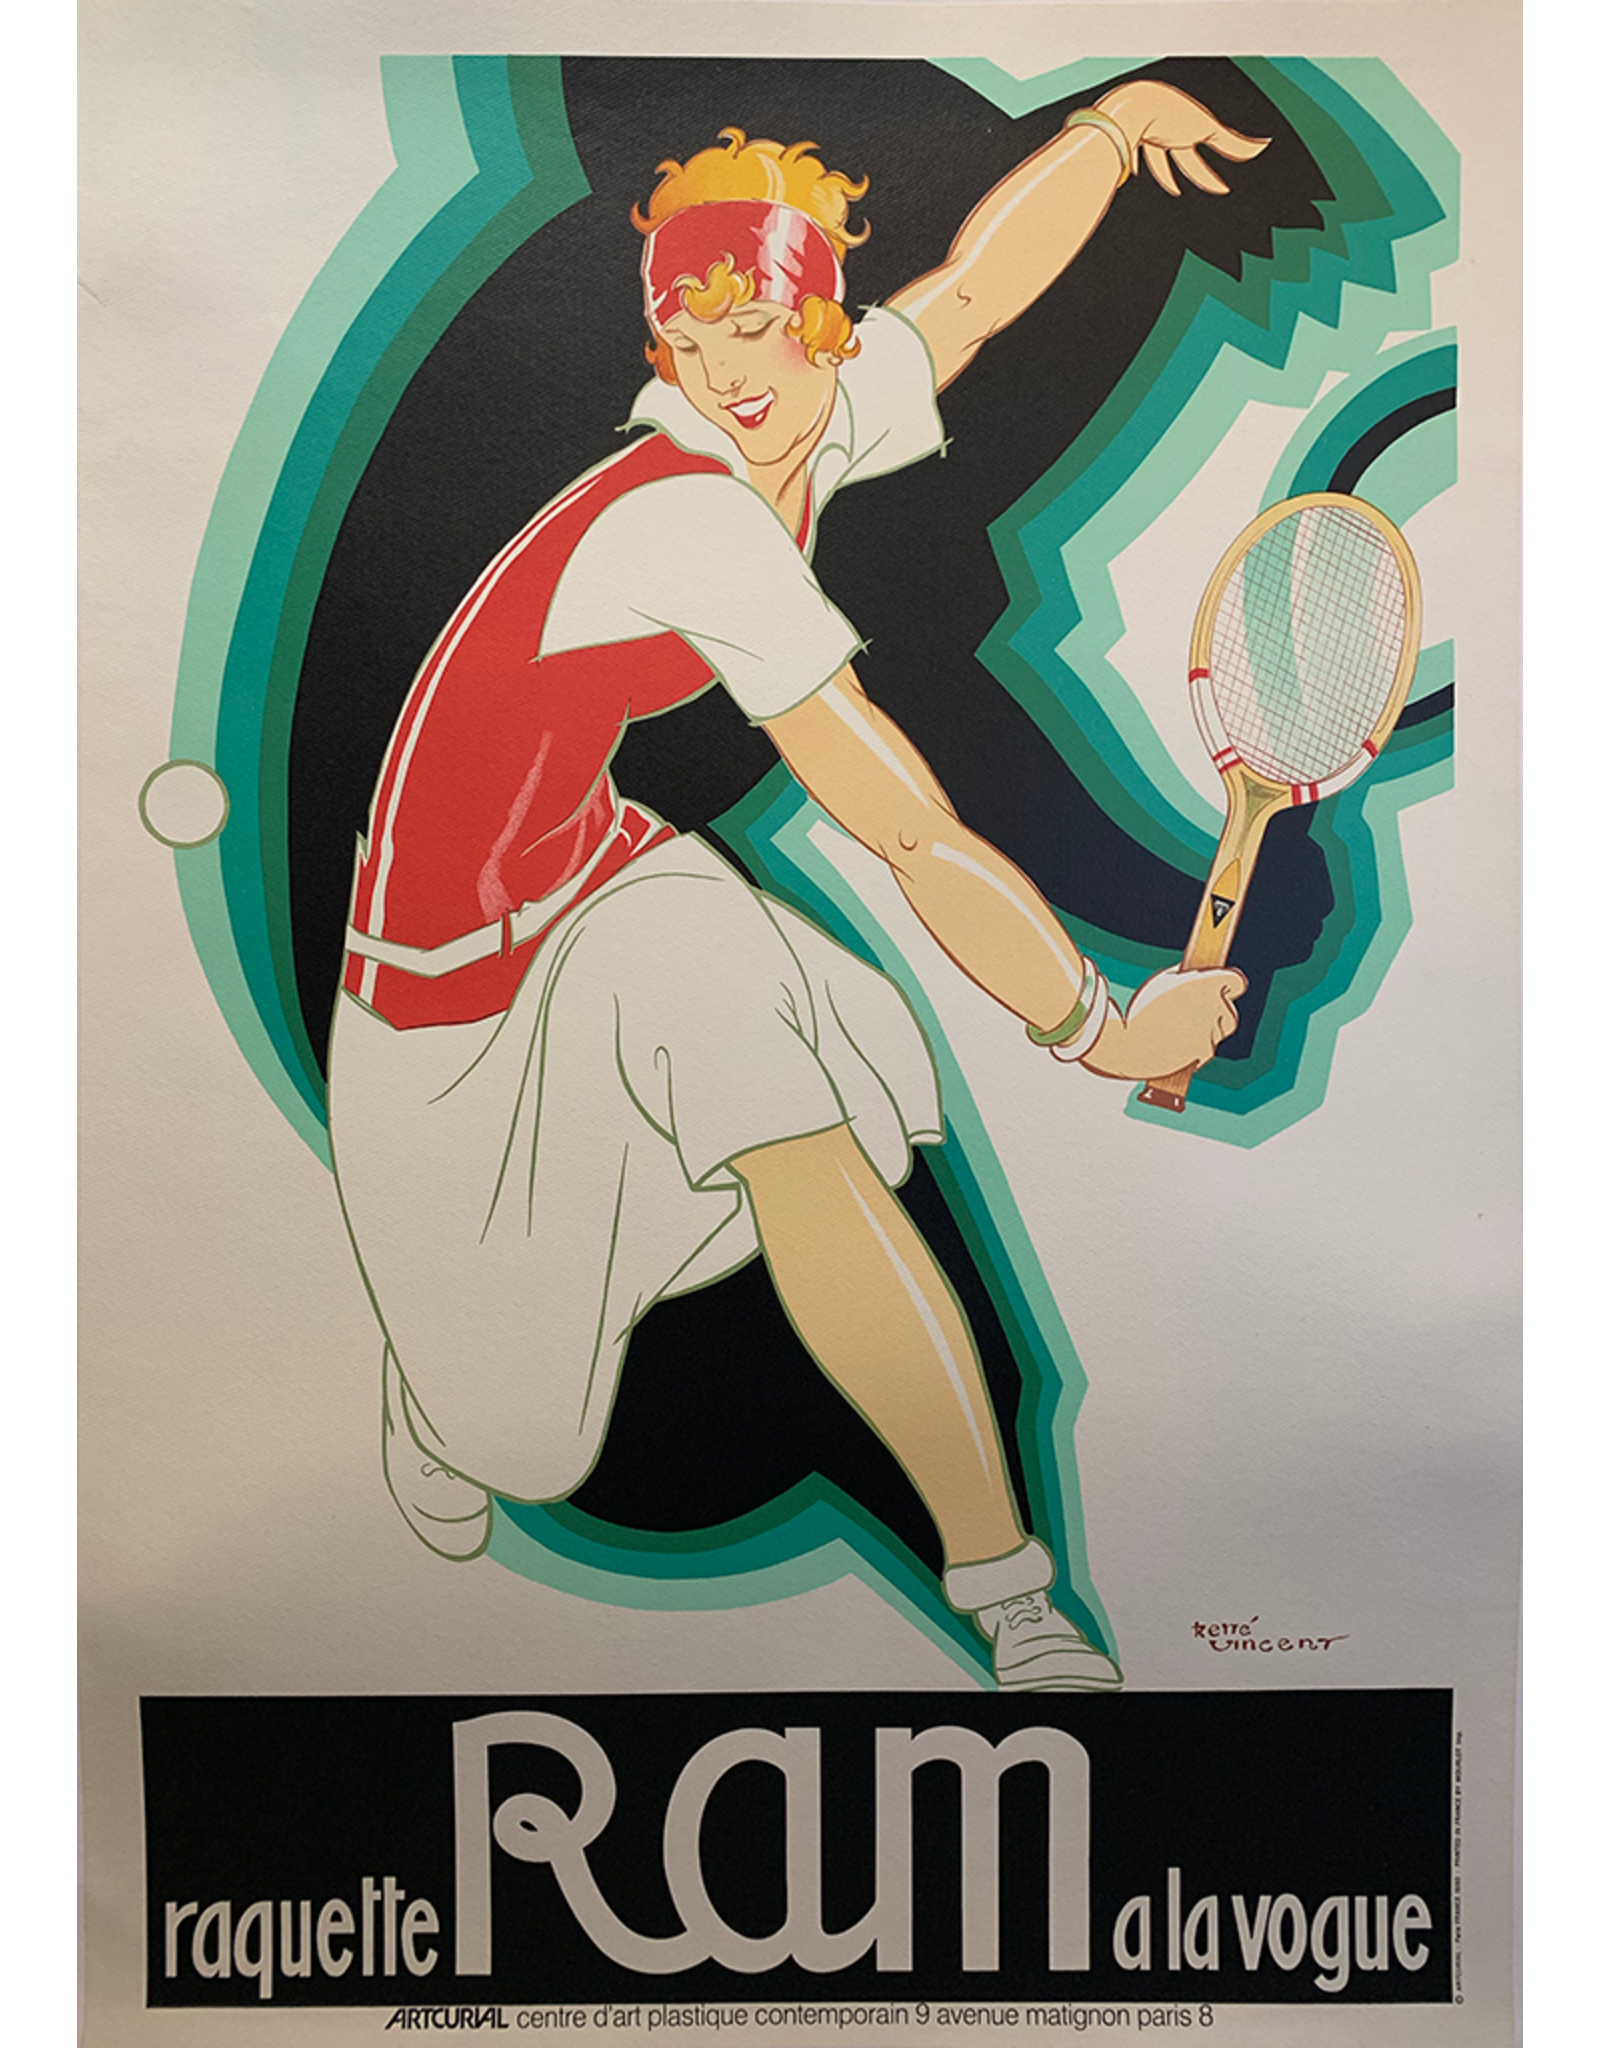 SPV Racquette Ram